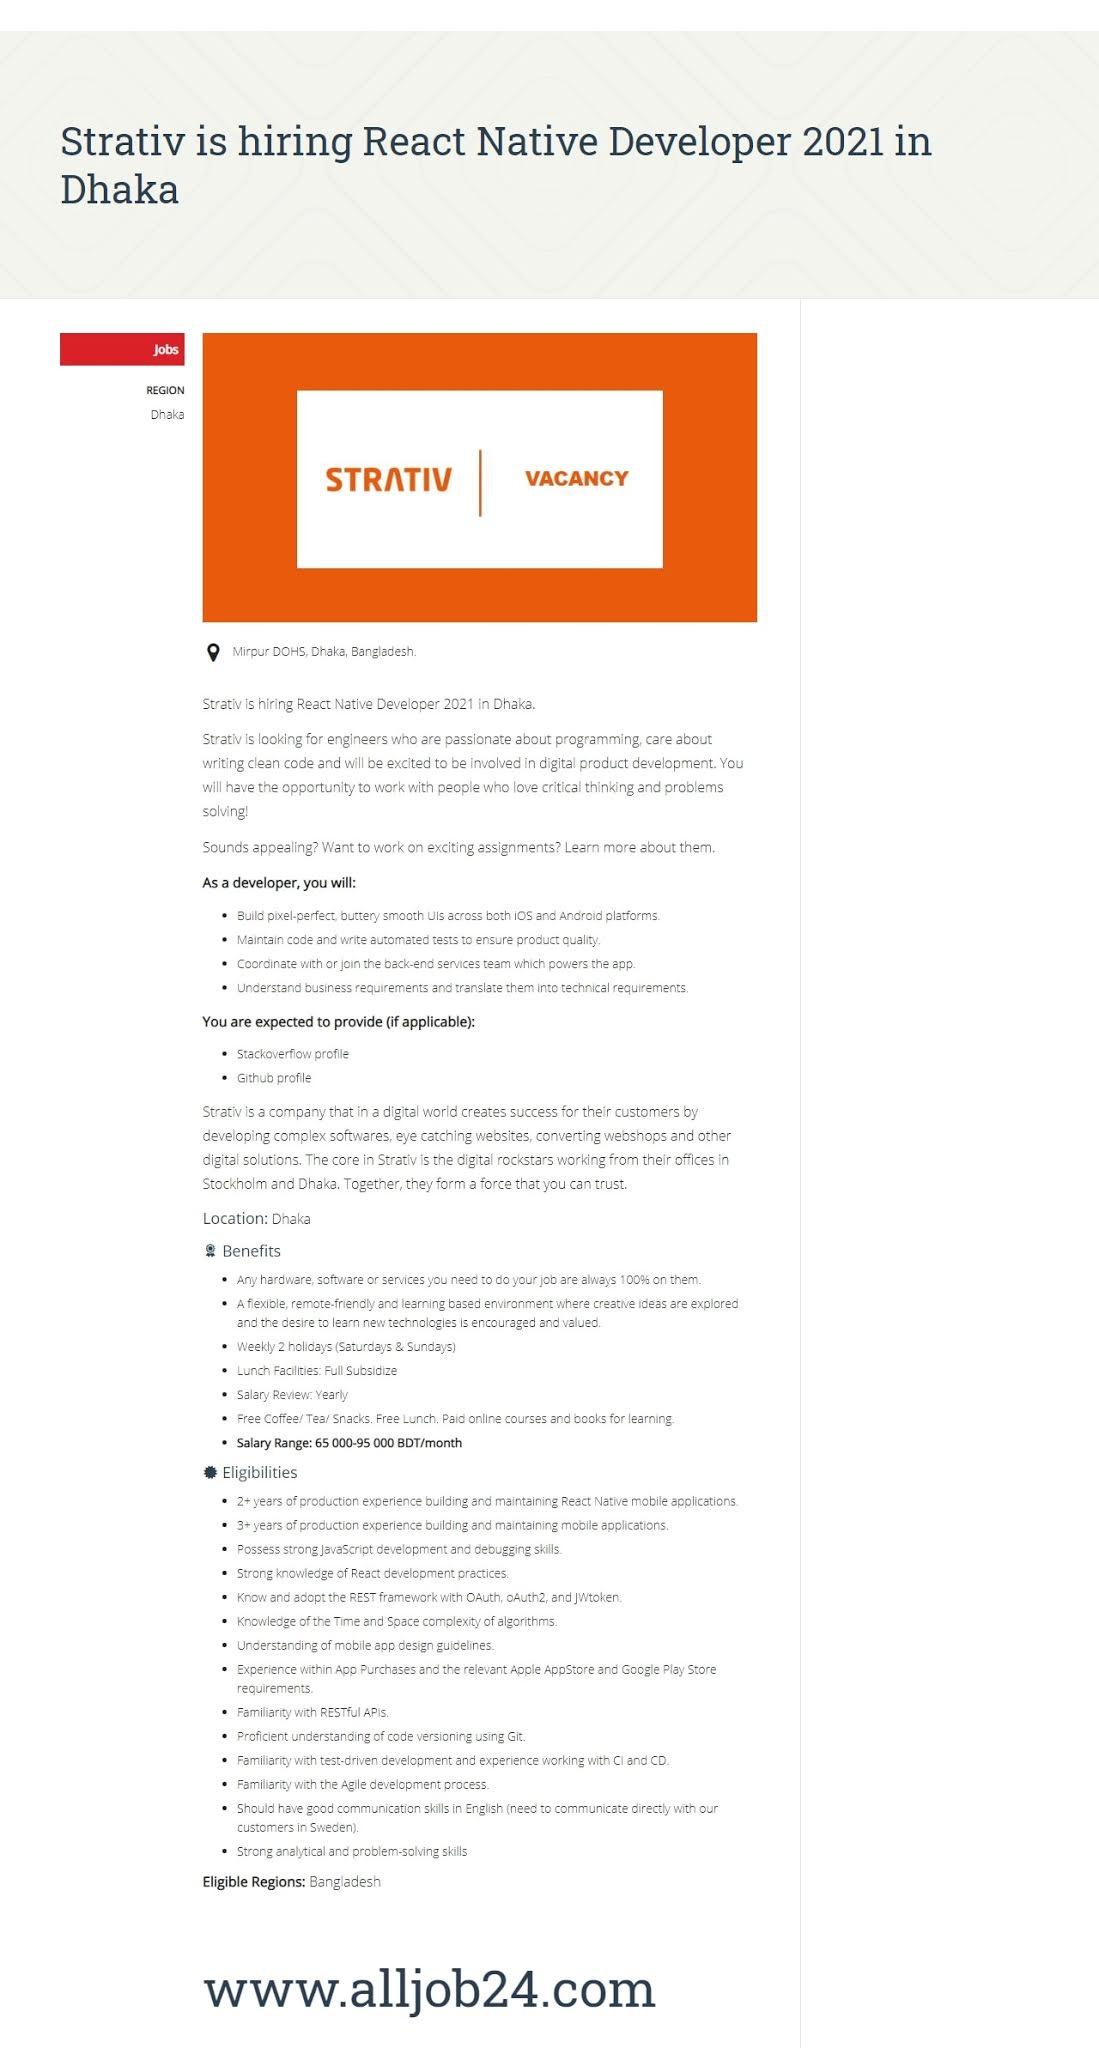 Strativ-job-circular-in-bd-2021